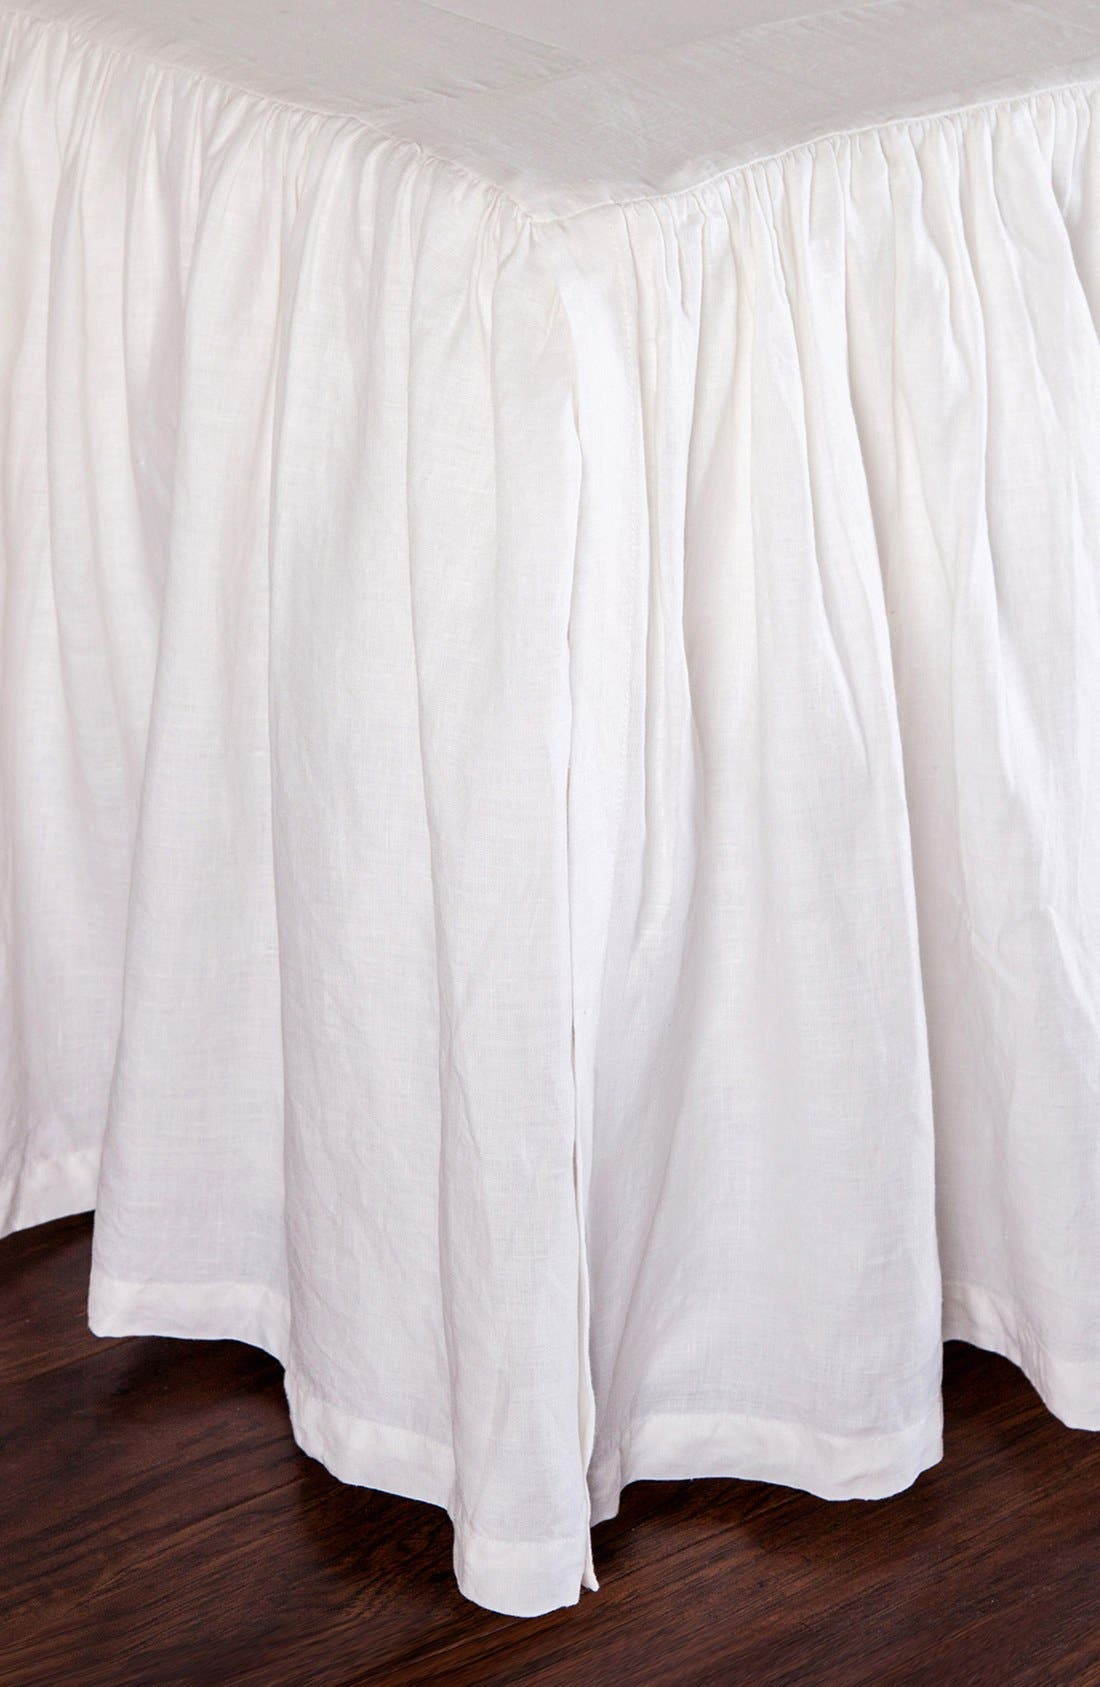 Gathered Linen Bed Skirt,                             Main thumbnail 1, color,                             WHITE